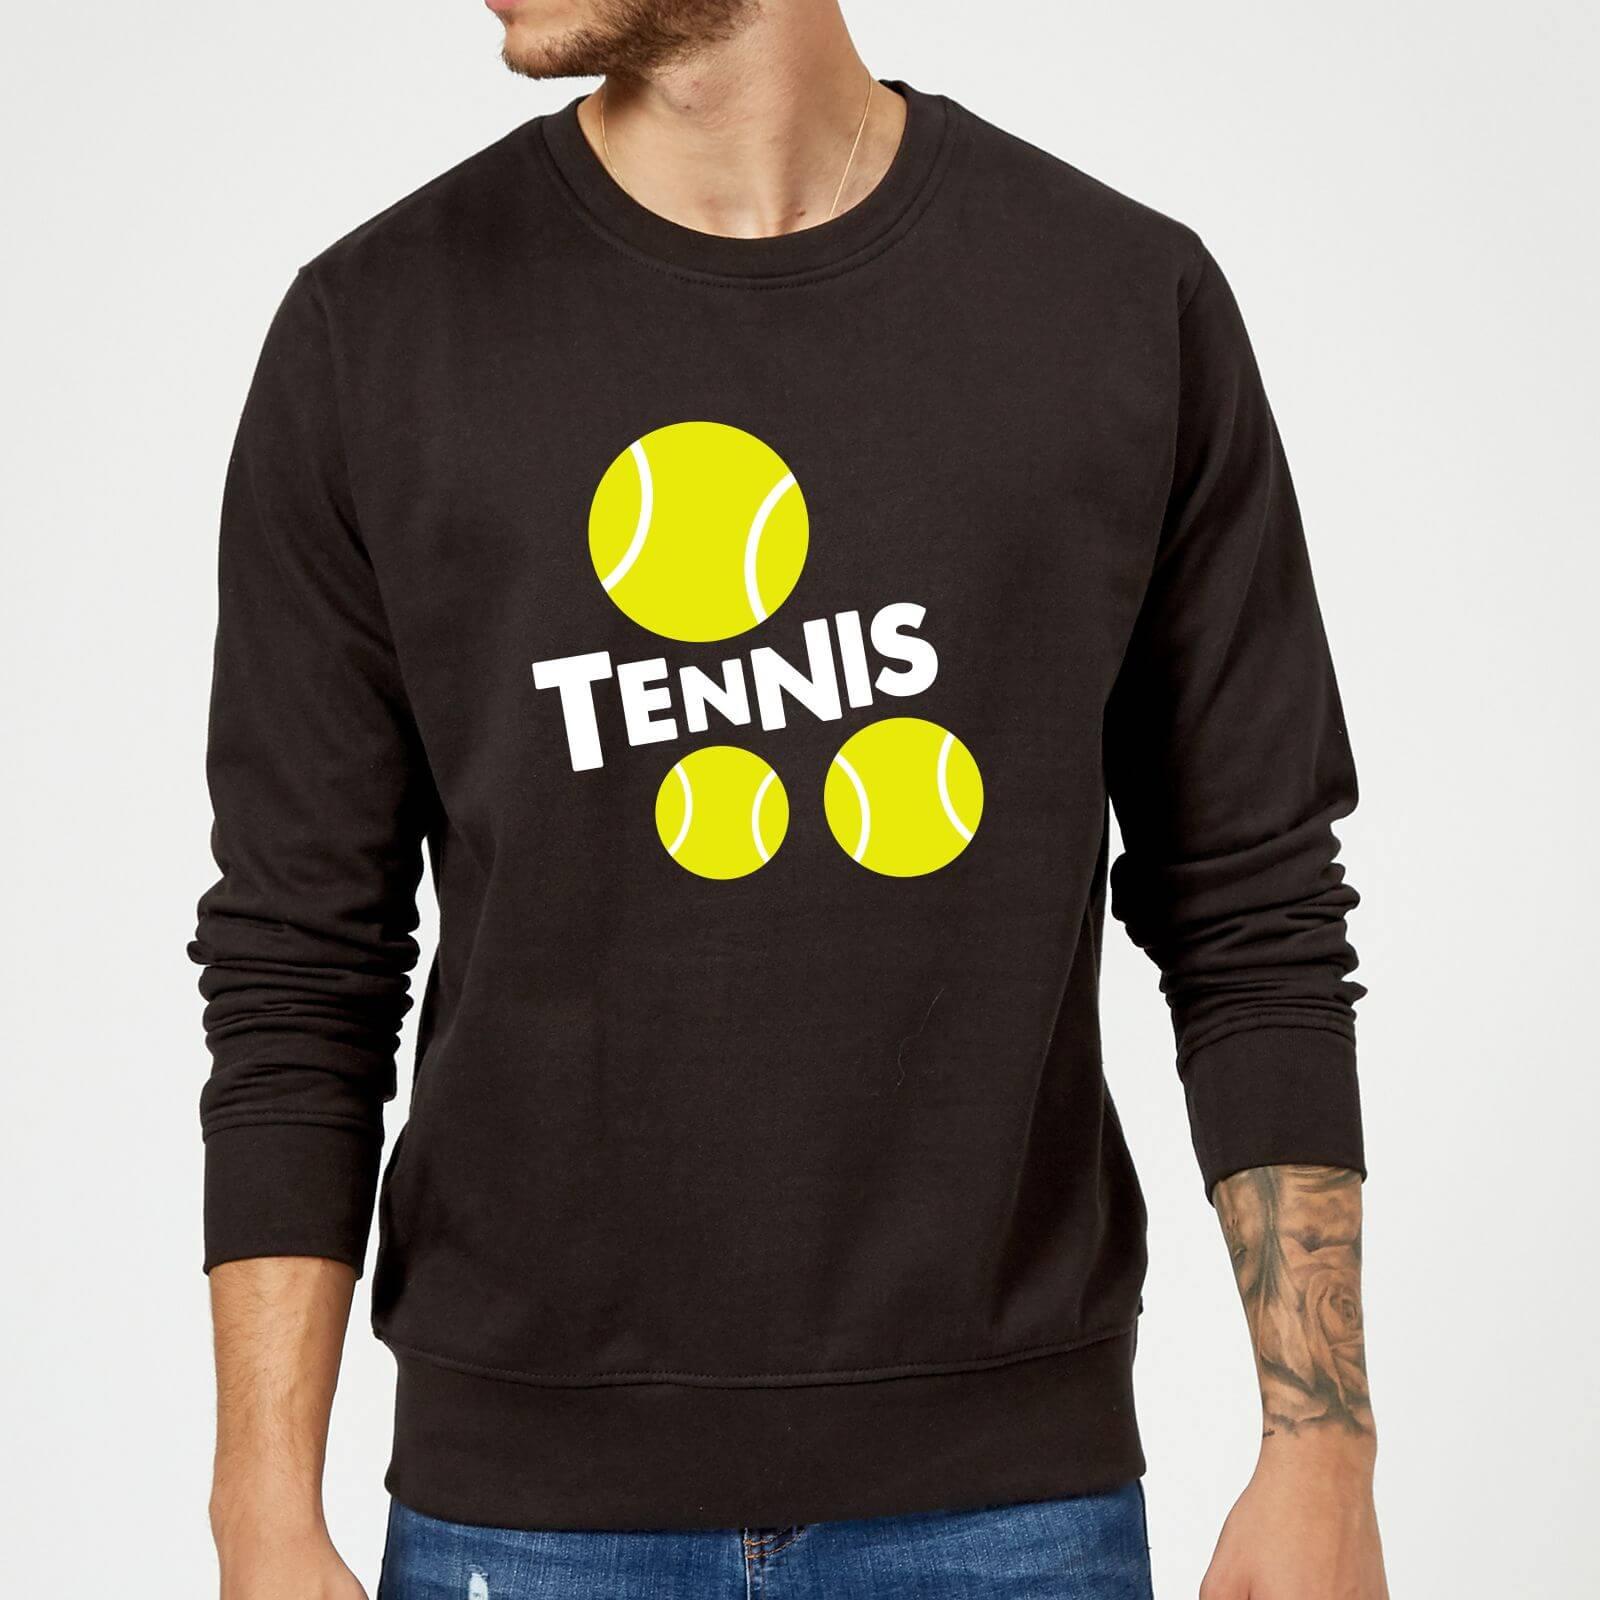 Tennis Balls Sweatshirt - Black - M - Black